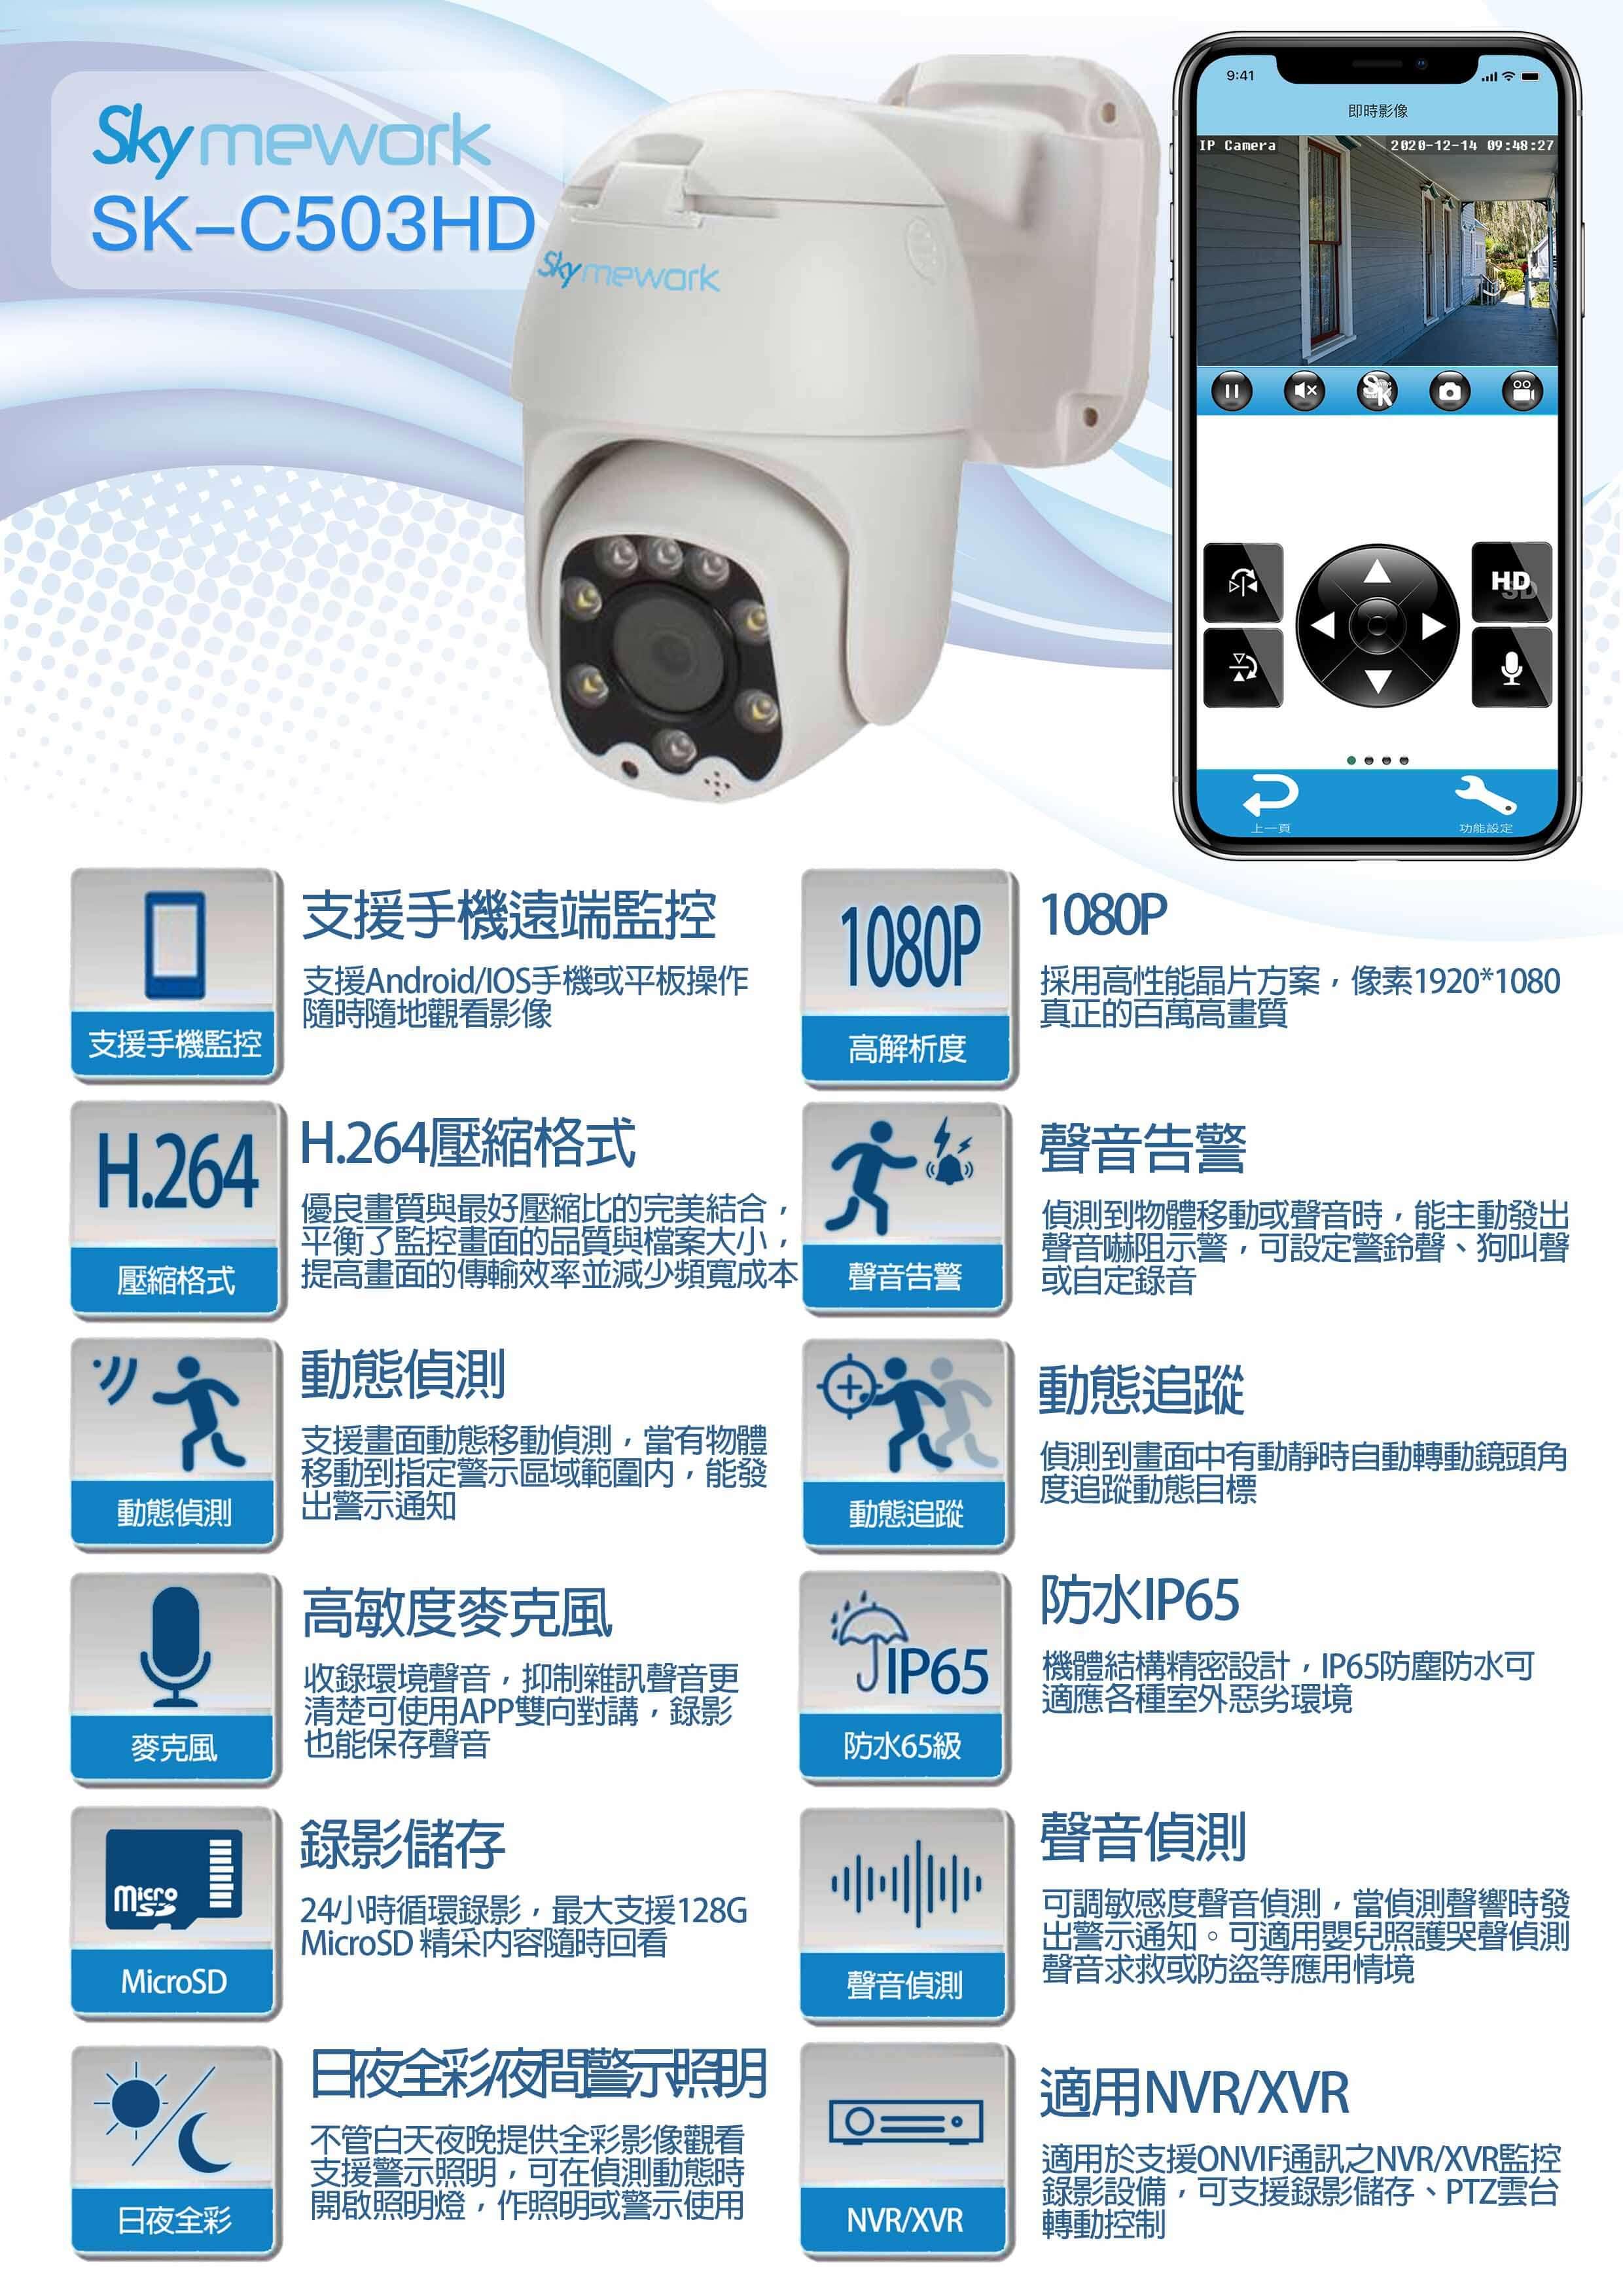 C503 1 - SK-C503HD 1080P 自帶雲台動態追蹤 戶外防水攝影機